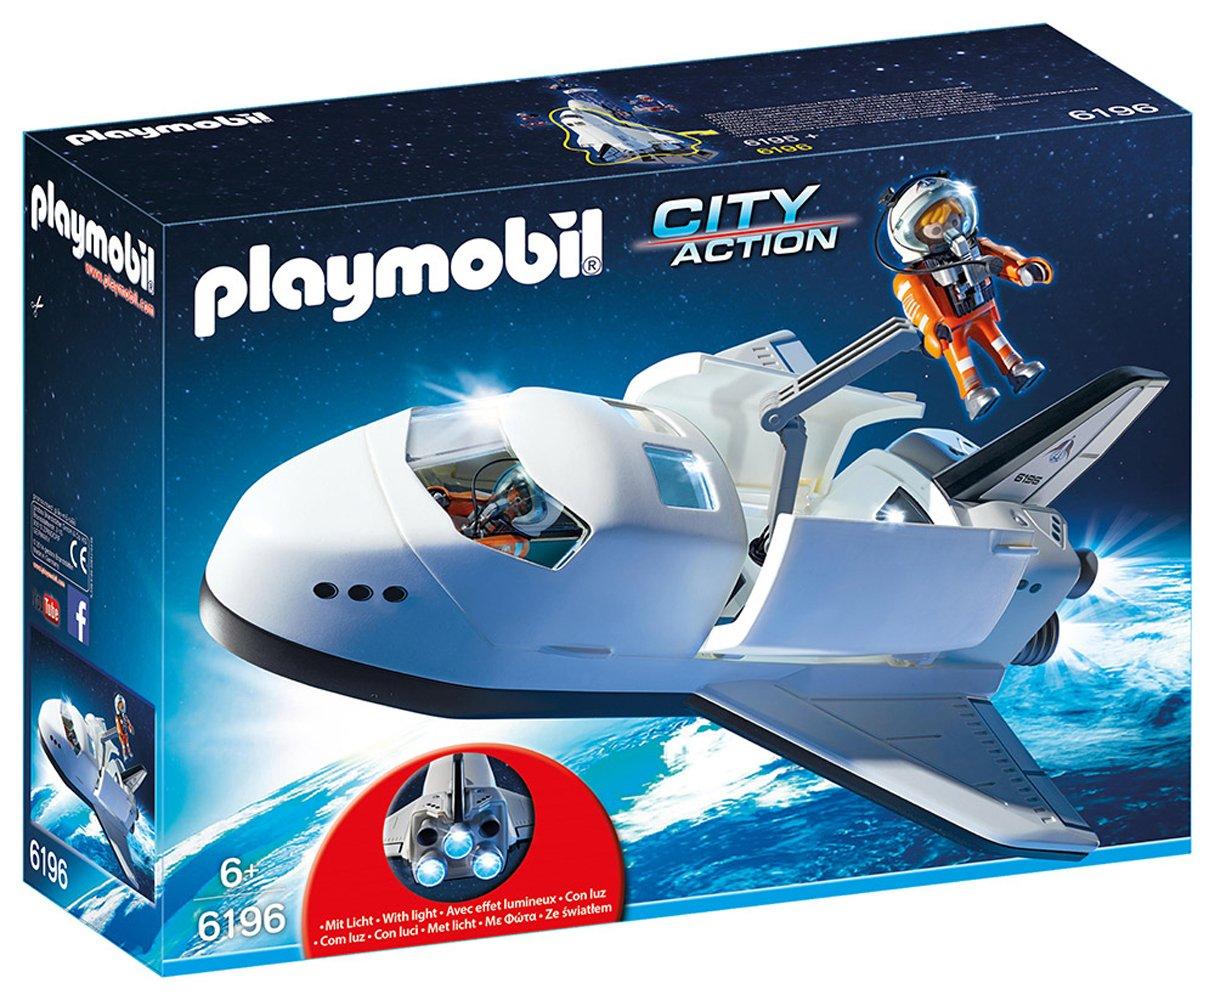 Cranbury 6196 PLAYMOBIL Space Shuttle Playmobil